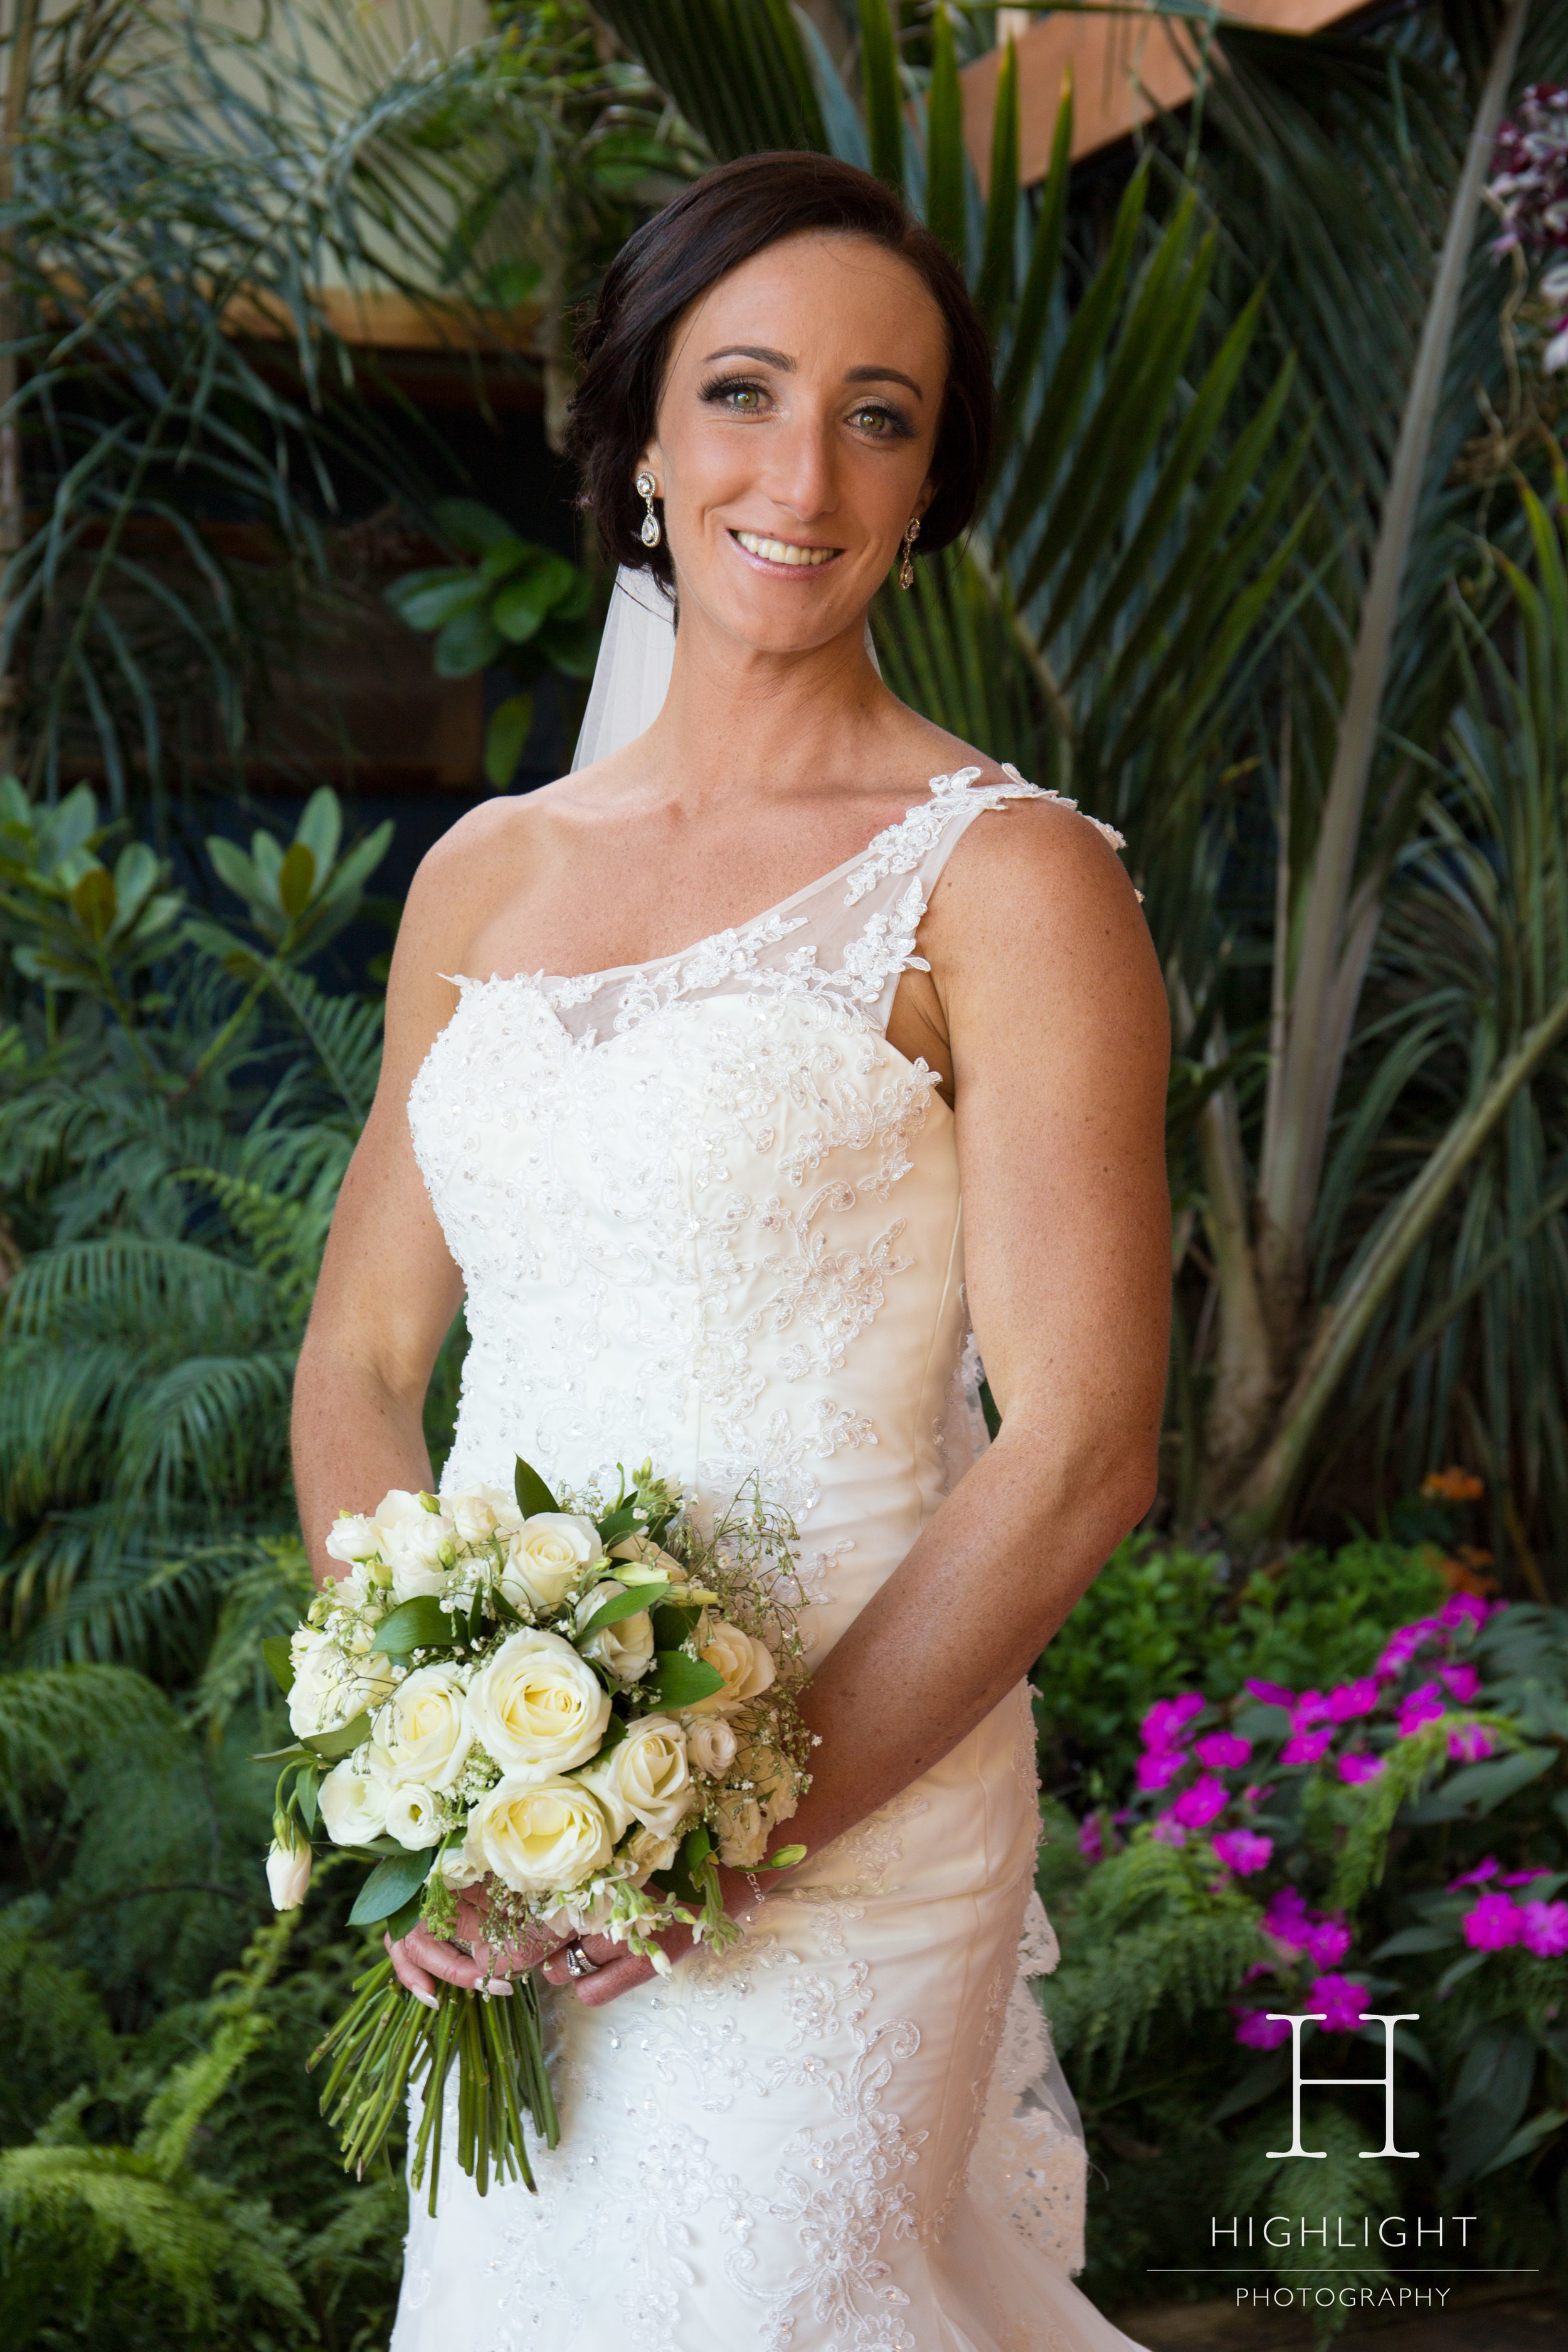 highlight_kc_bride_garden_wellington.jpg